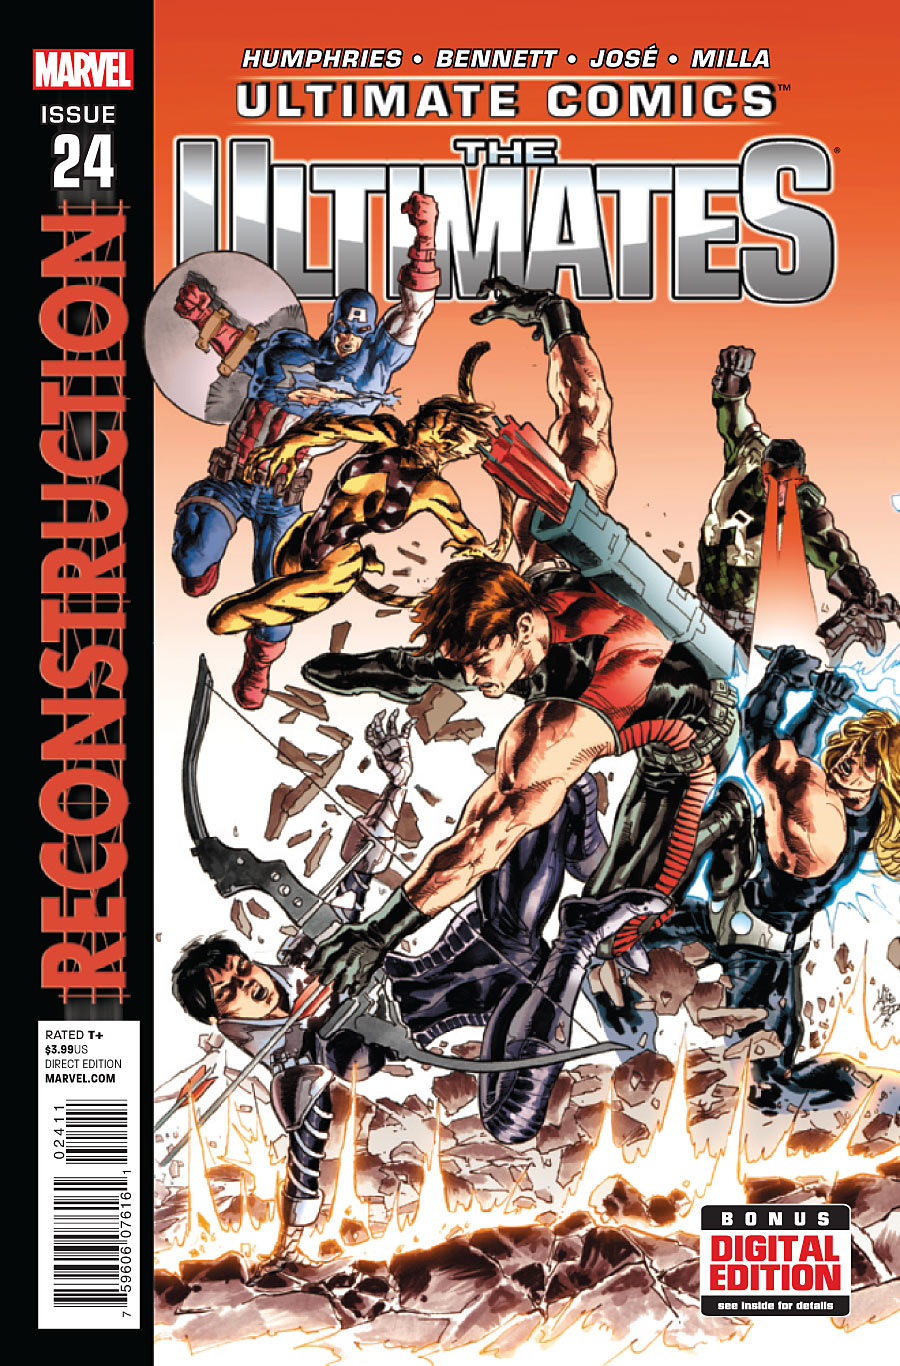 Ultimate Comics: The Ultimates #24